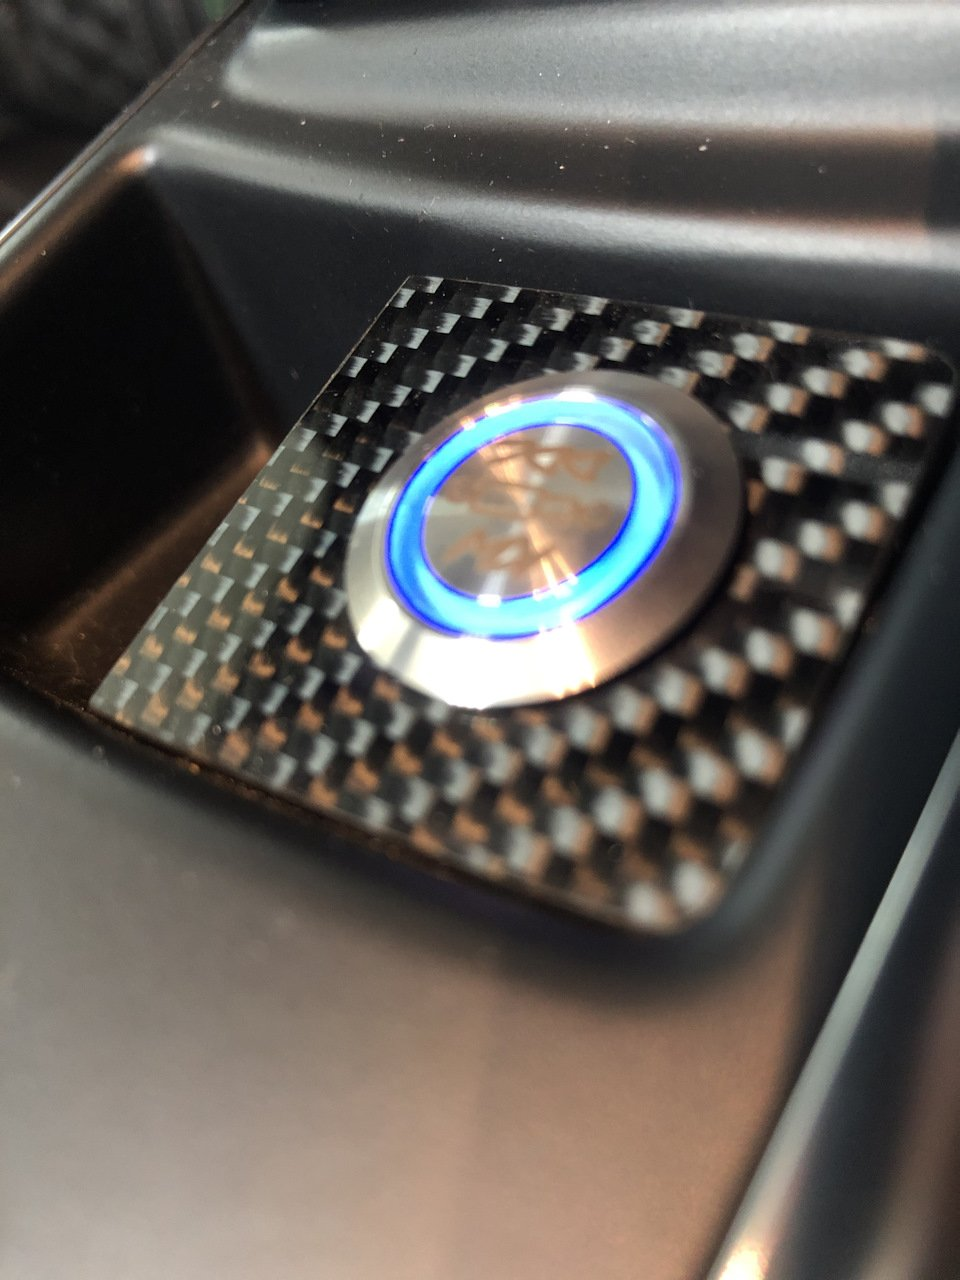 Mercedes-Benz G63 AMG 5.8 982HP 2012 (10)